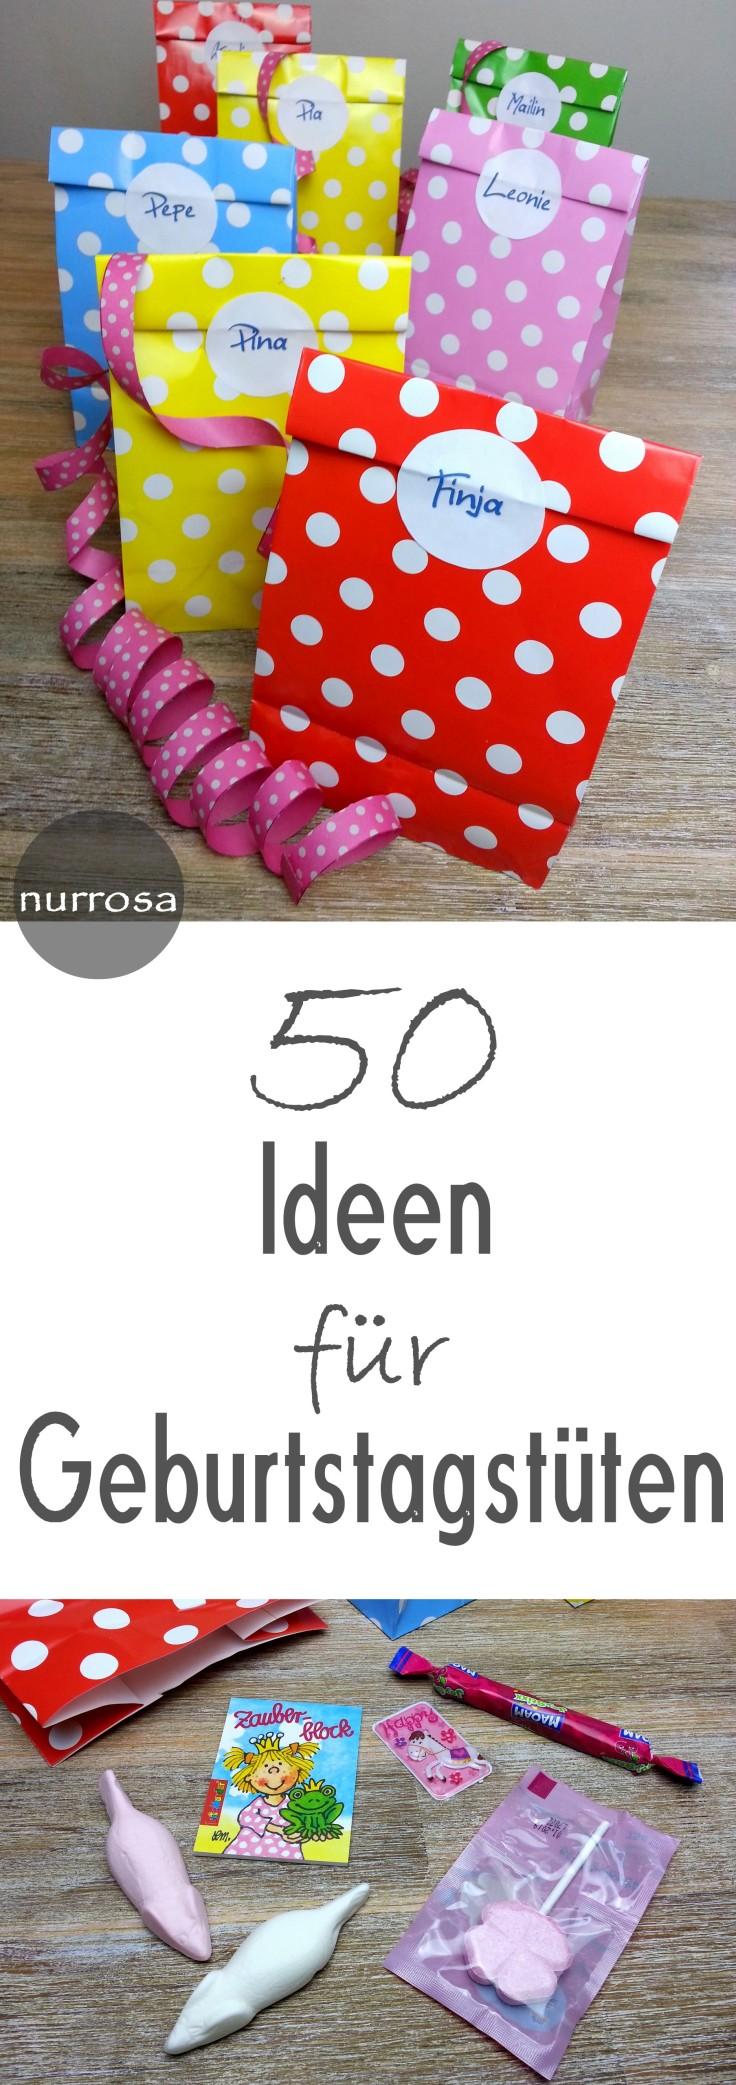 50 Ideen für Geburtstagsmitgebsel / Geburtstagstüten – nurrosa